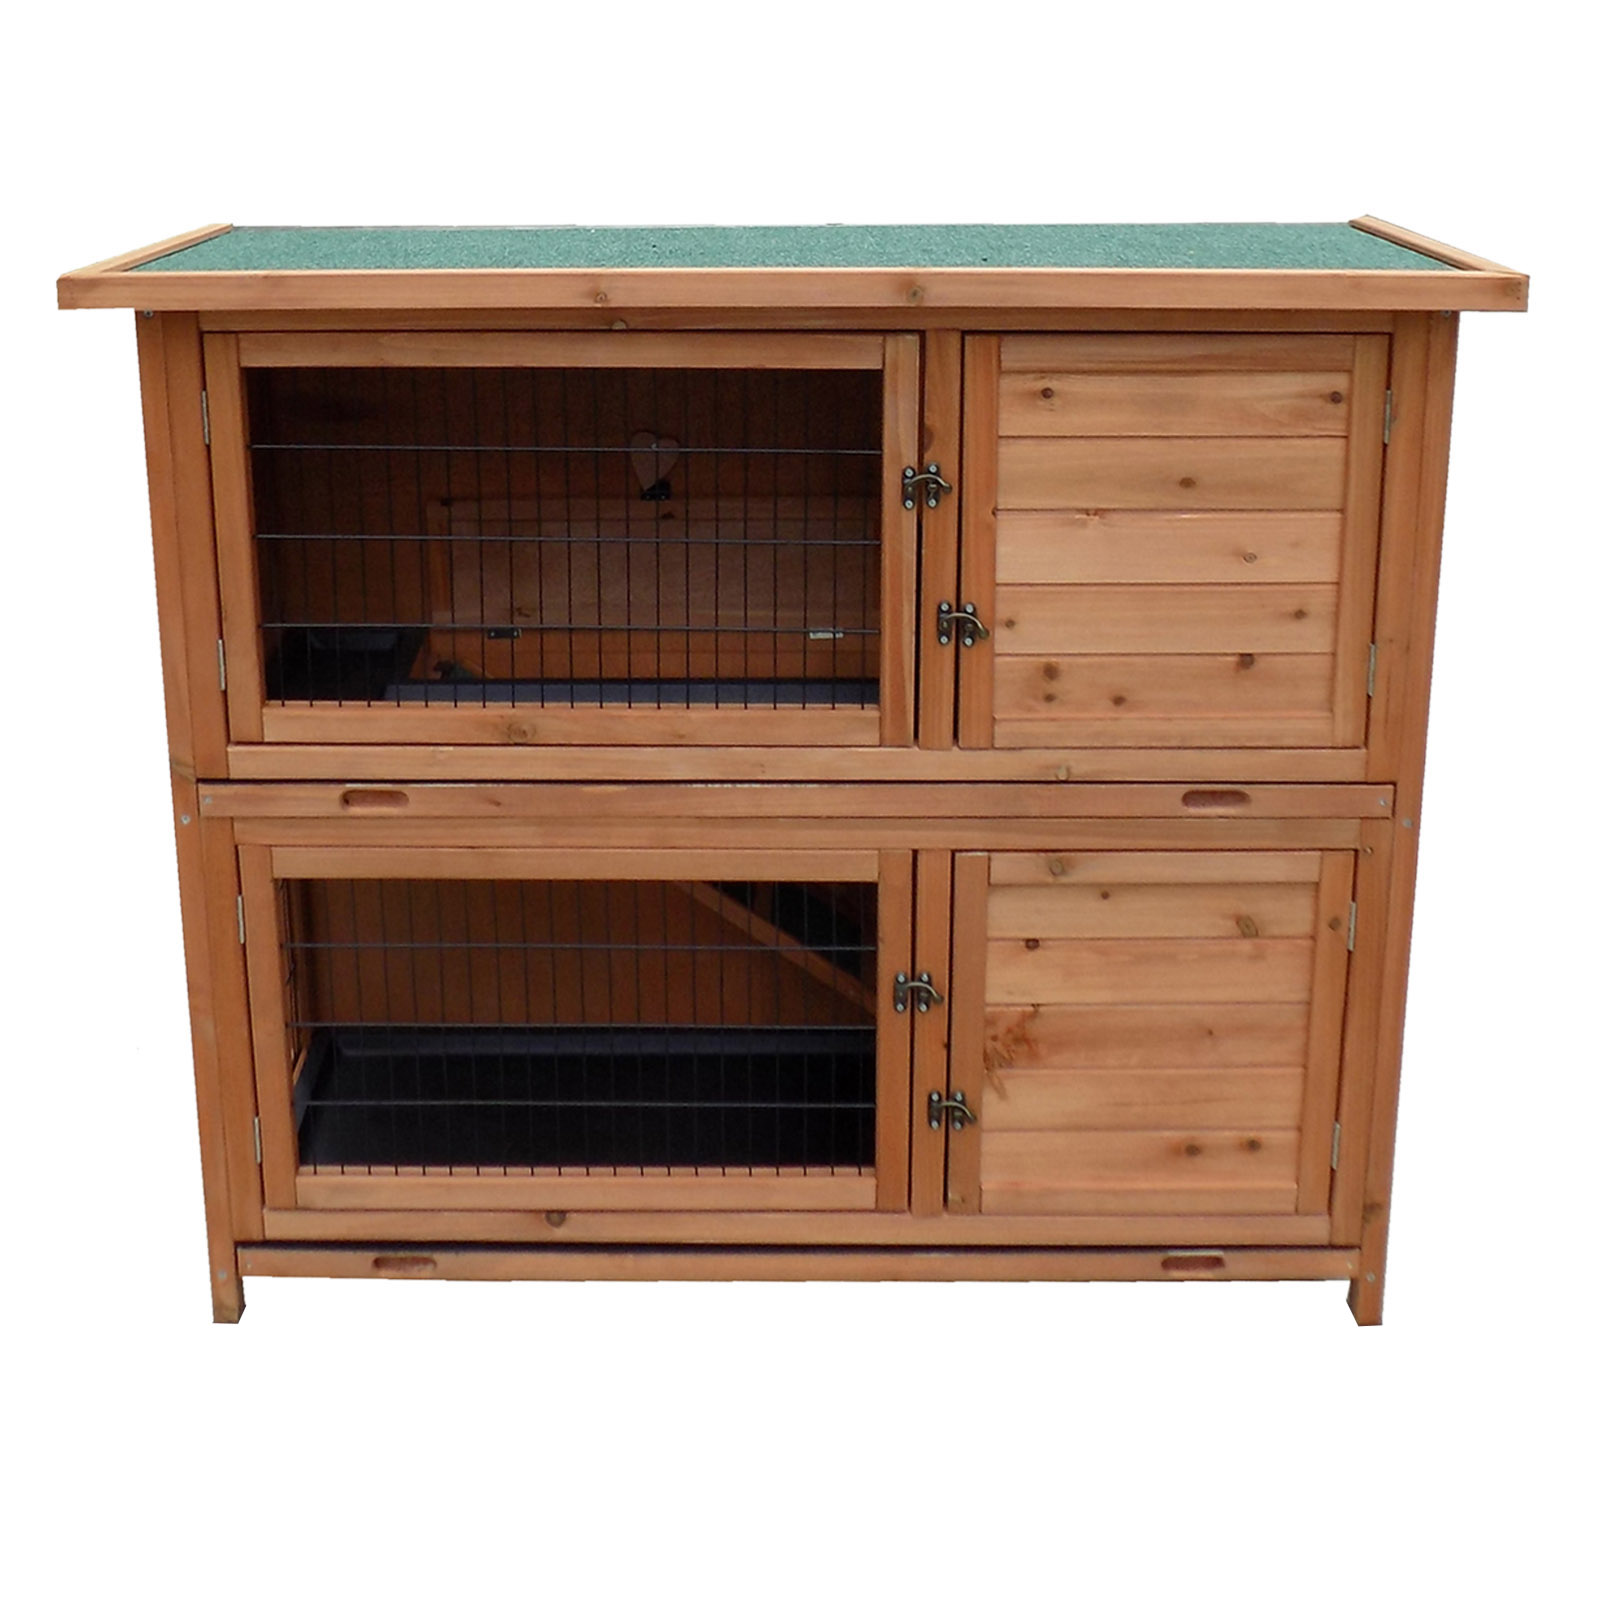 2 story luxury rabbit hutch wood pet house guineea gig for 2 rabbit hutch